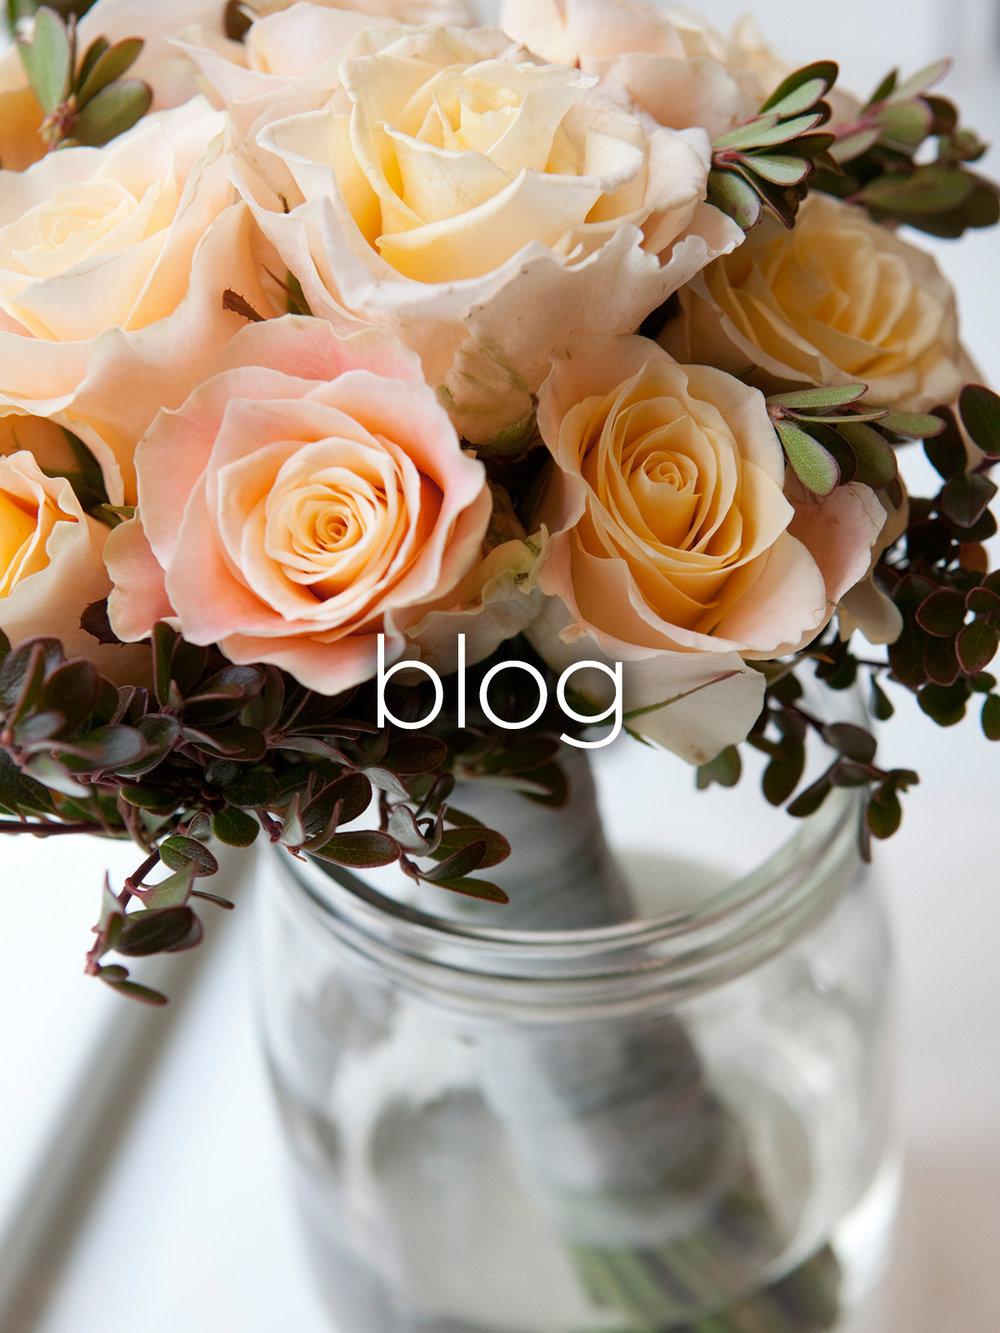 blog_Unit.jpg